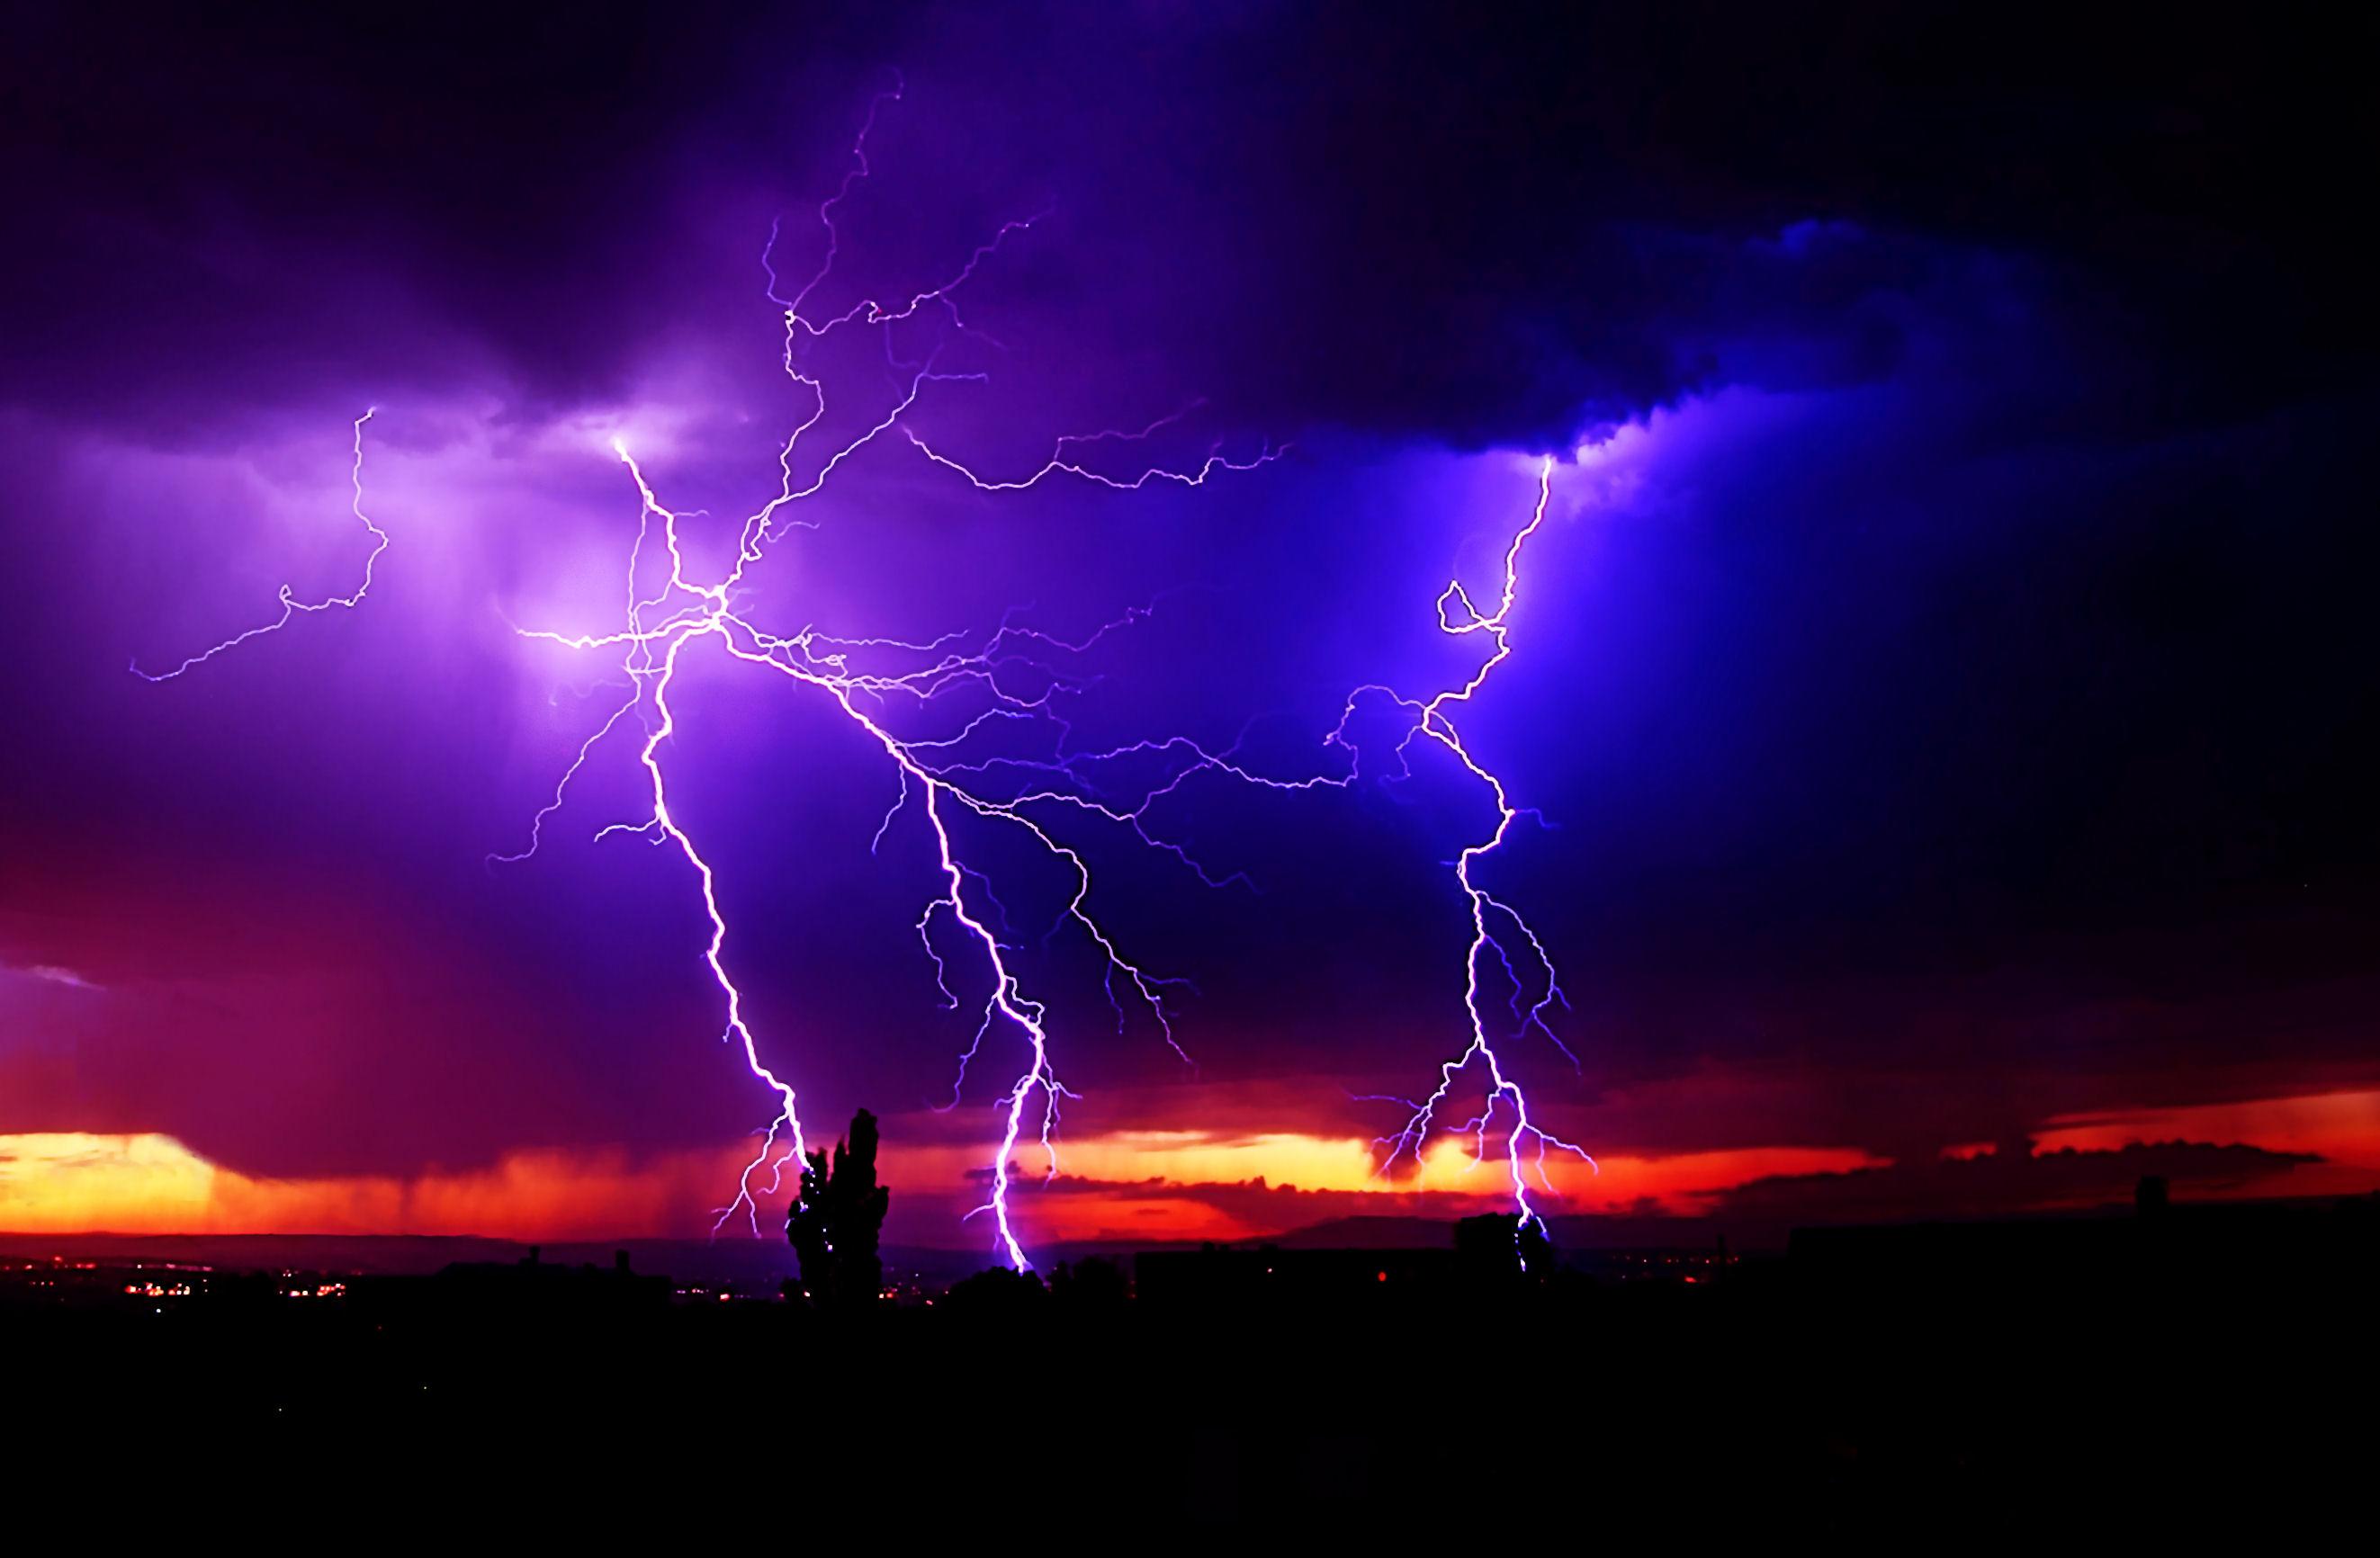 Impressive Lightning Storms for your Desktop Wallpaper Thomas Craig 2645x1732